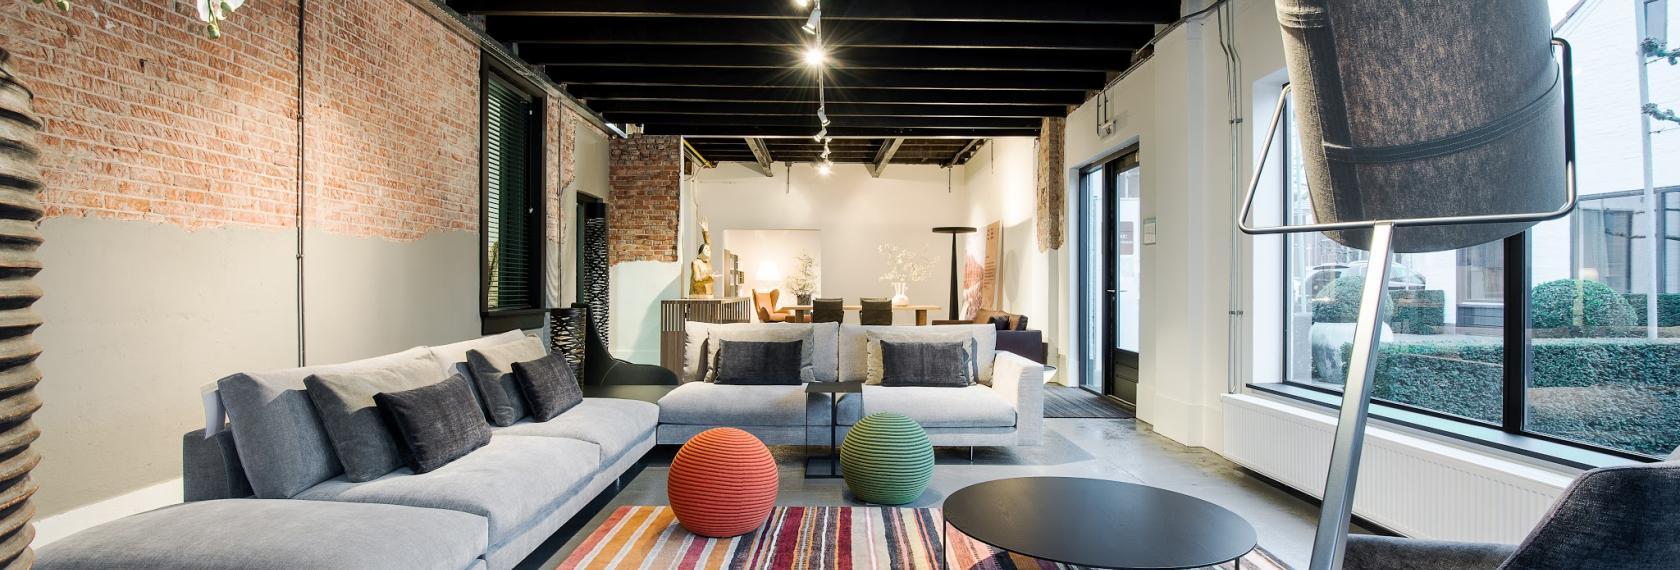 Slijkhuis interieur design het continent for Interieur accessoires design